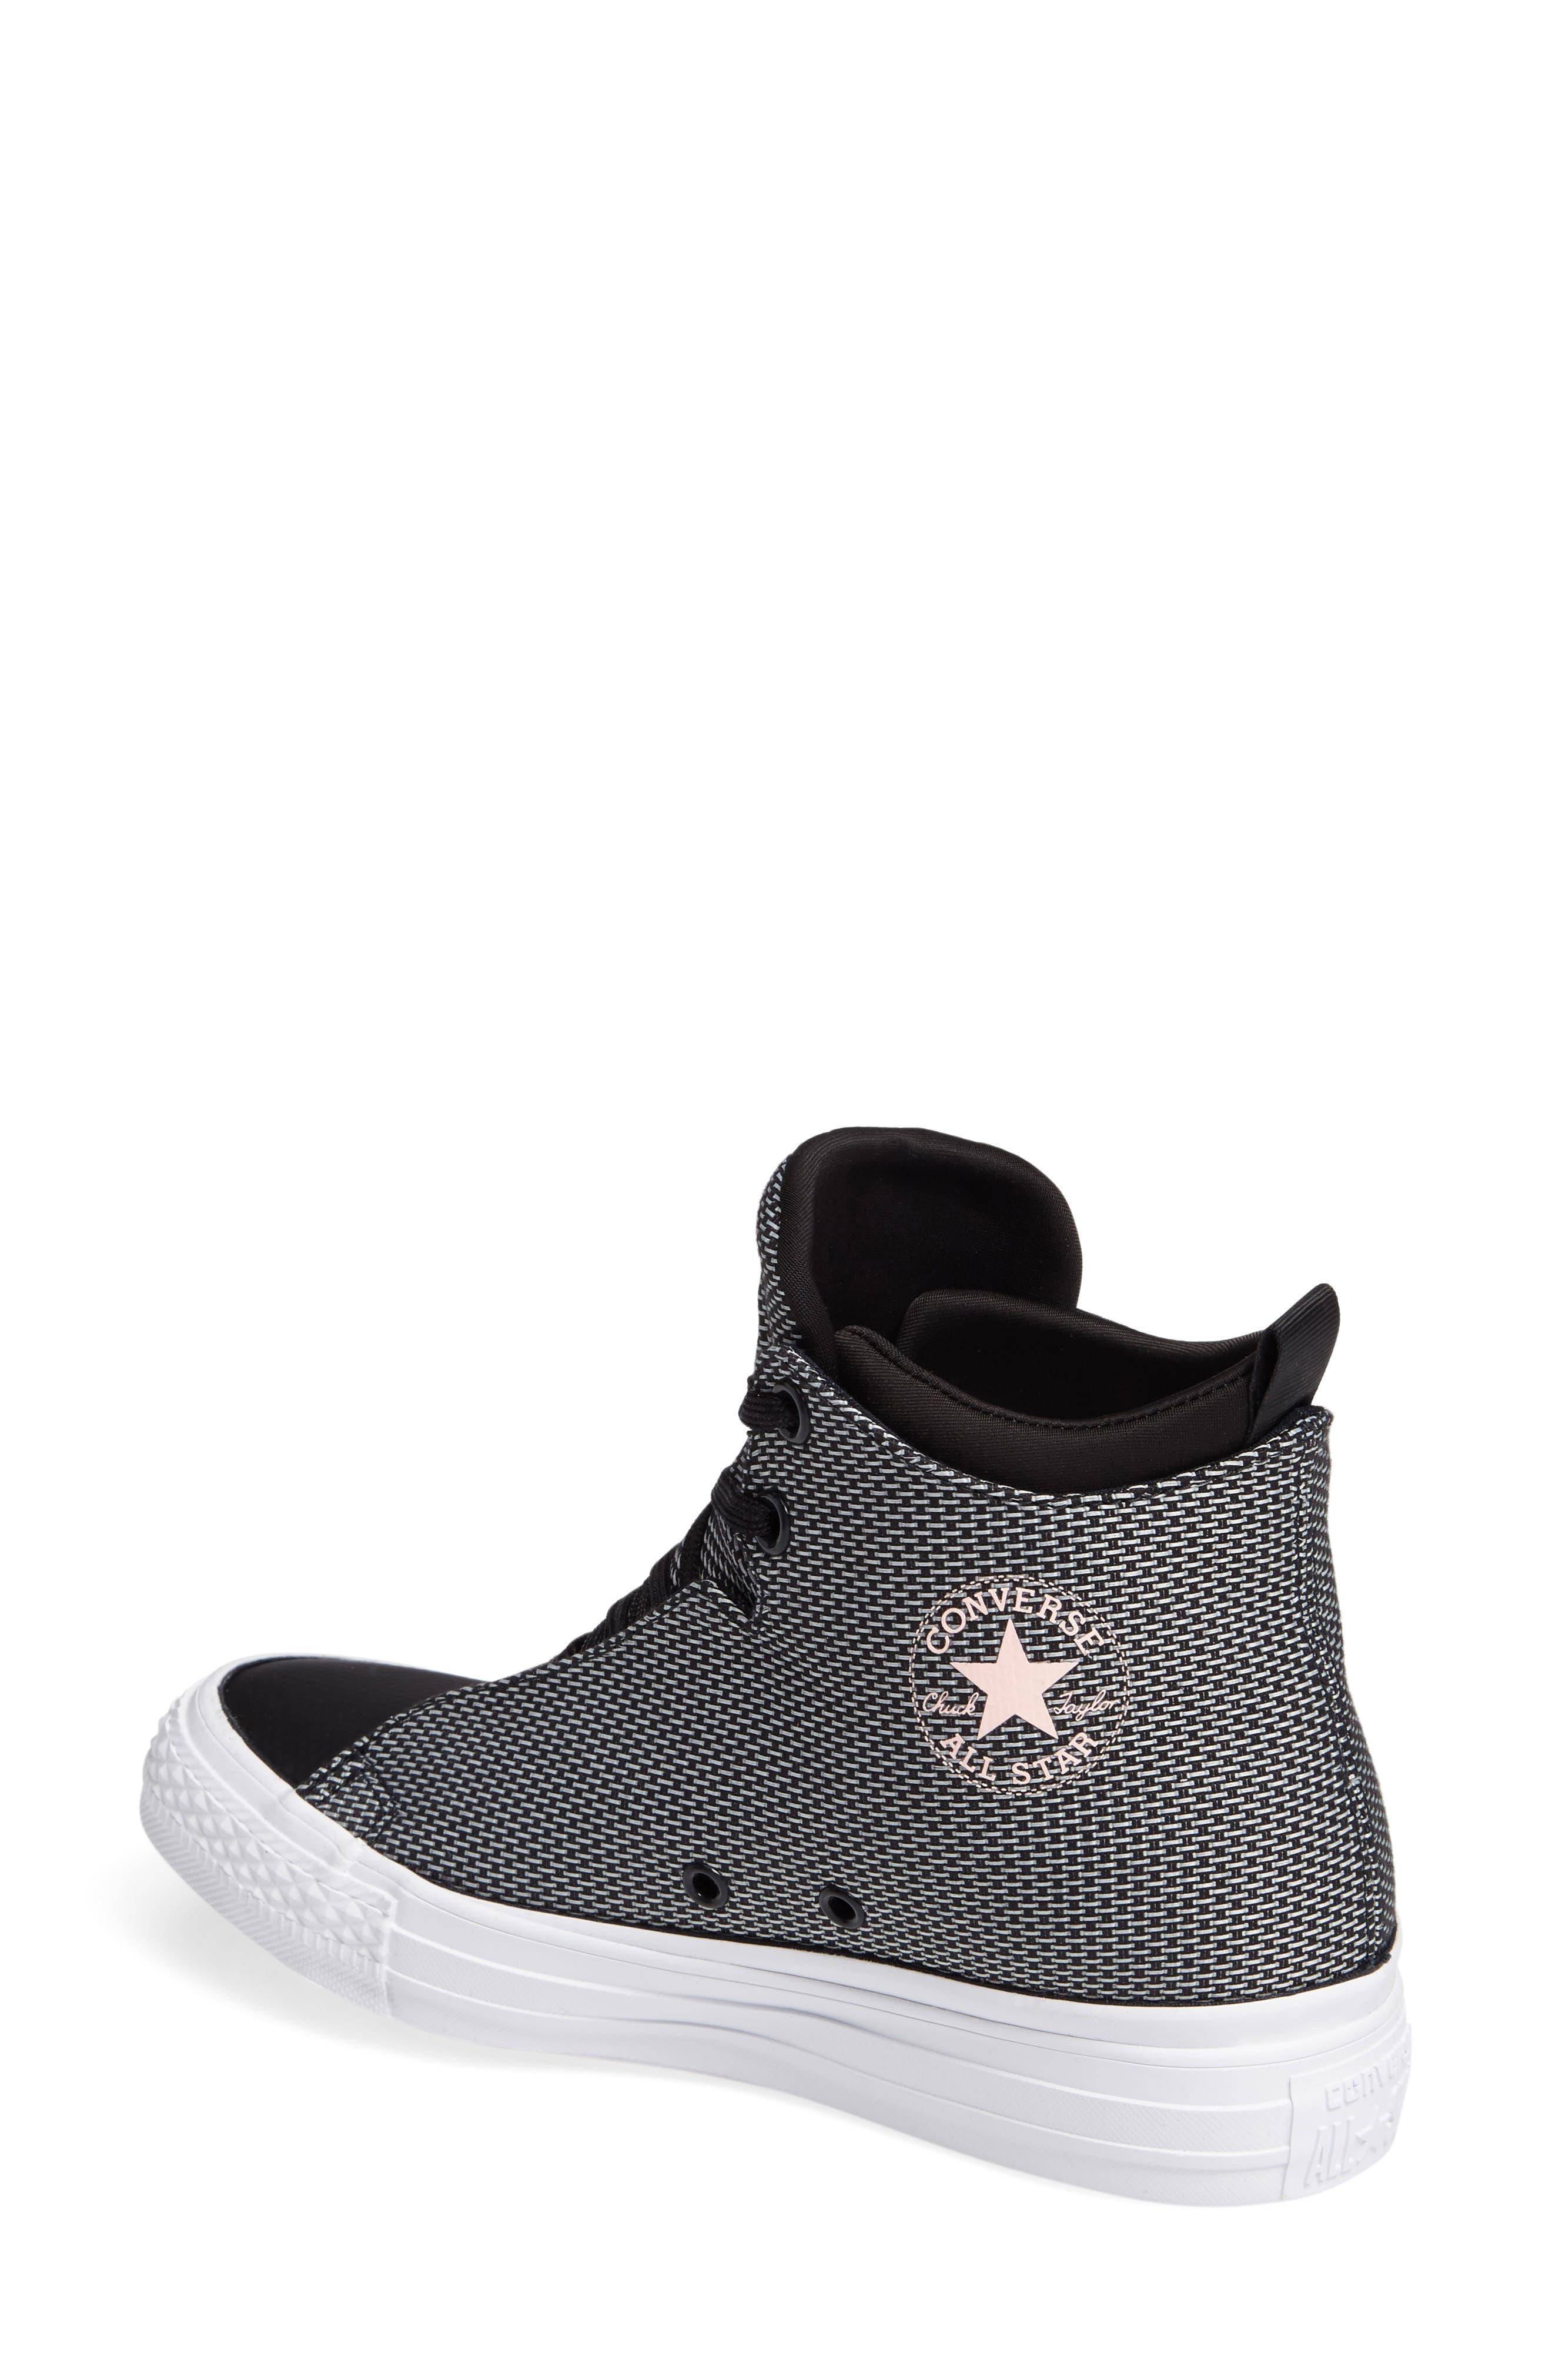 Alternate Image 2  - Converse Chuck Taylor® All Star® Selene High Top Sneaker (Women)